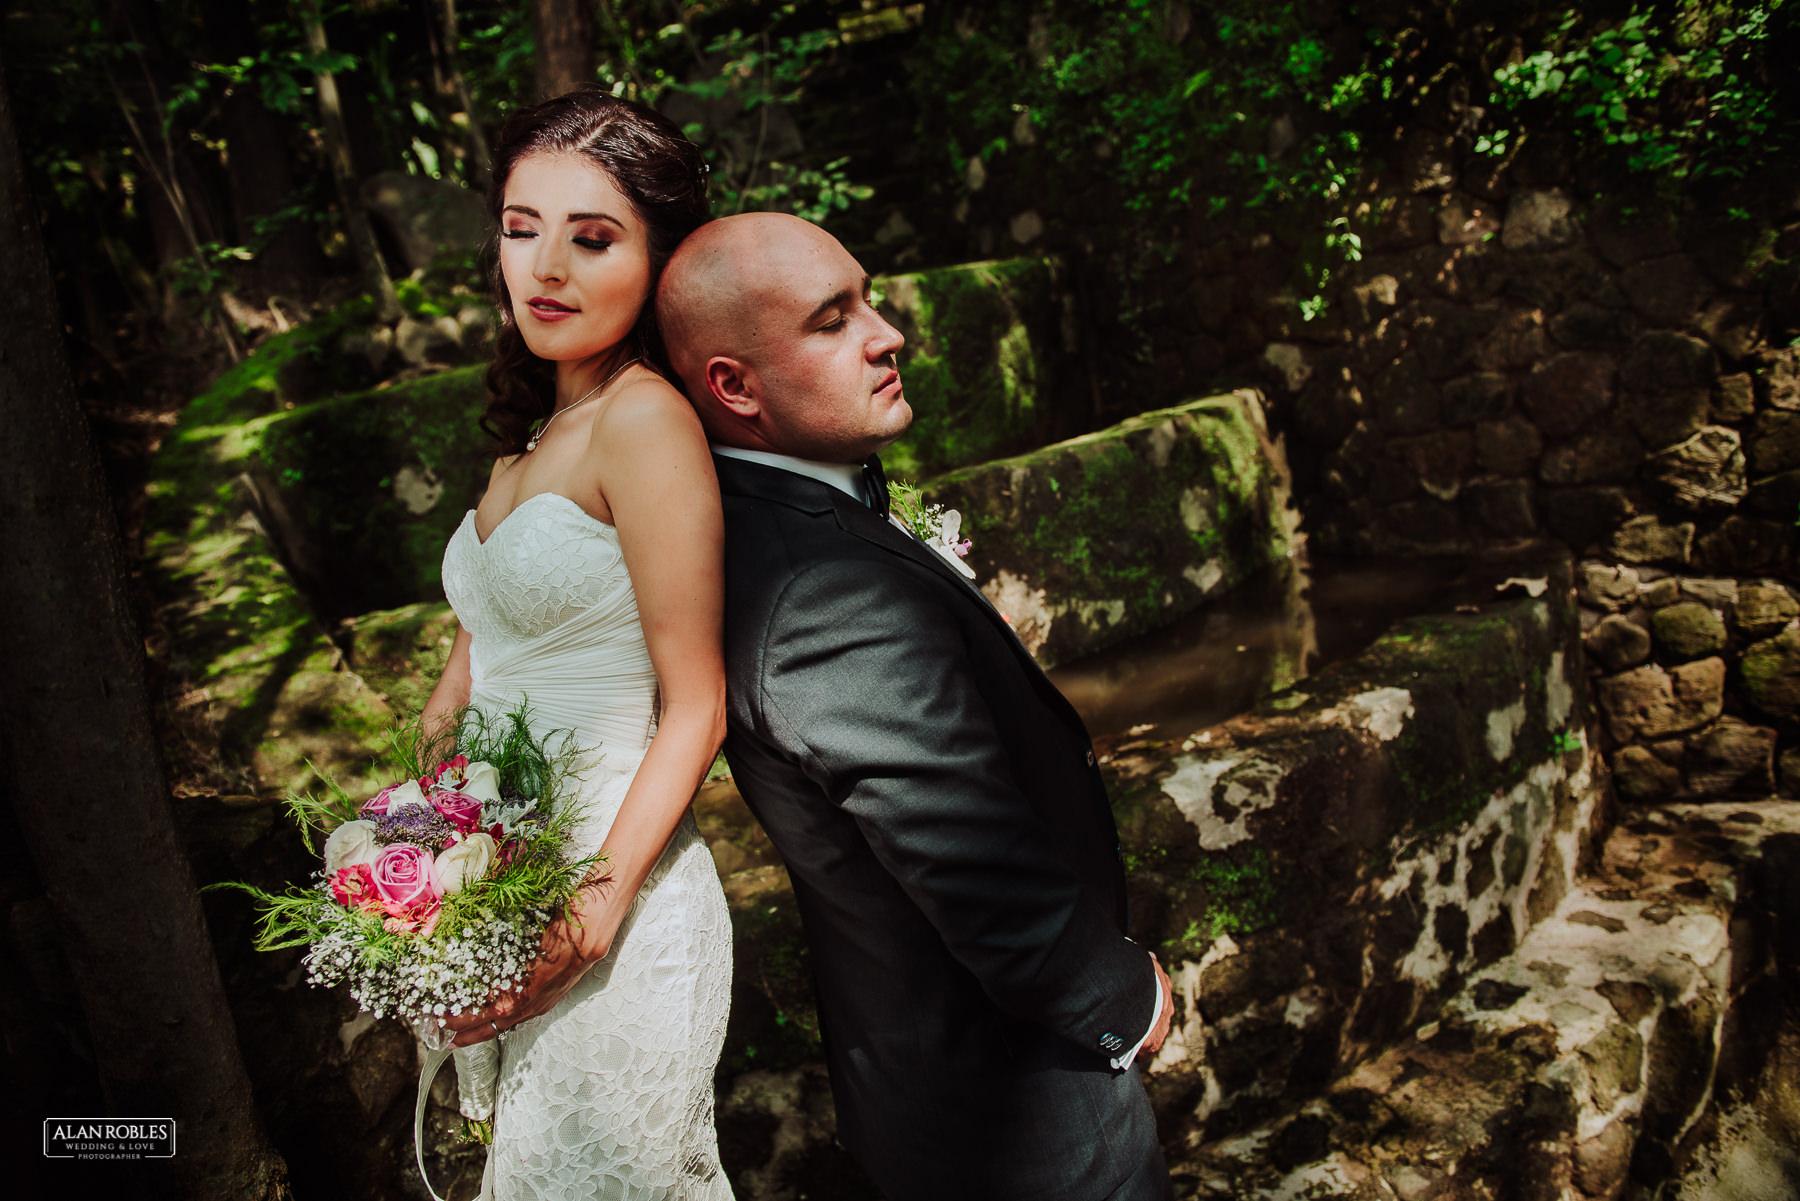 Fotografo de bodas guadalajara Alan Robles - Pinare terraza bistro 15